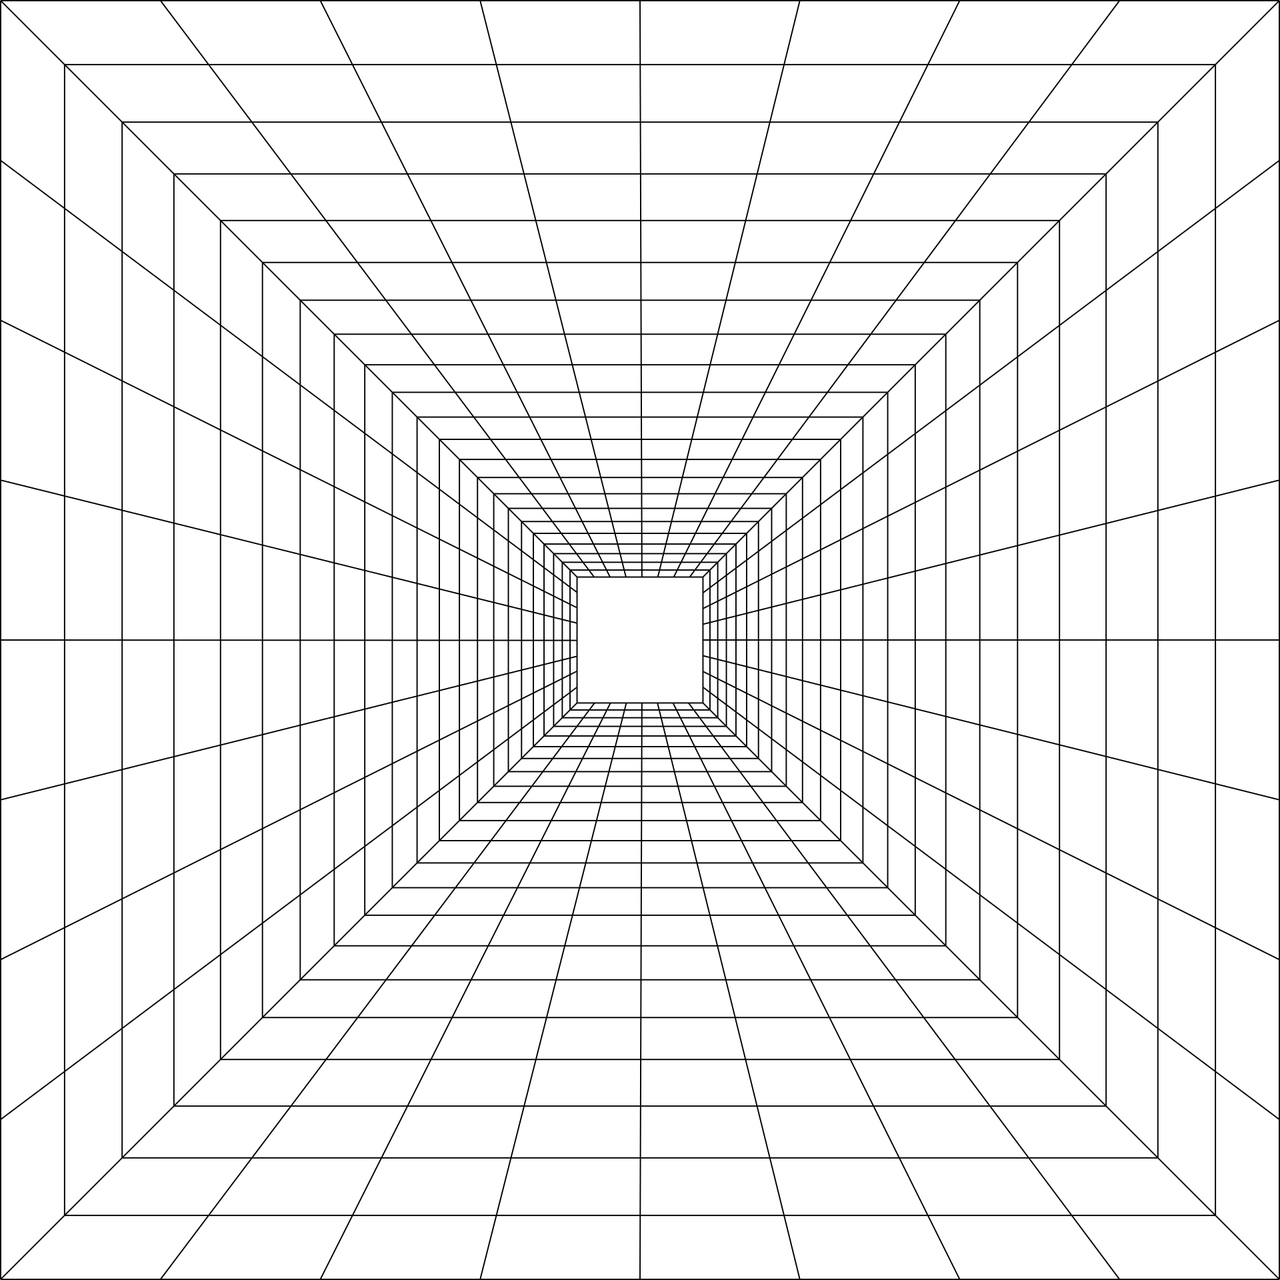 18020901